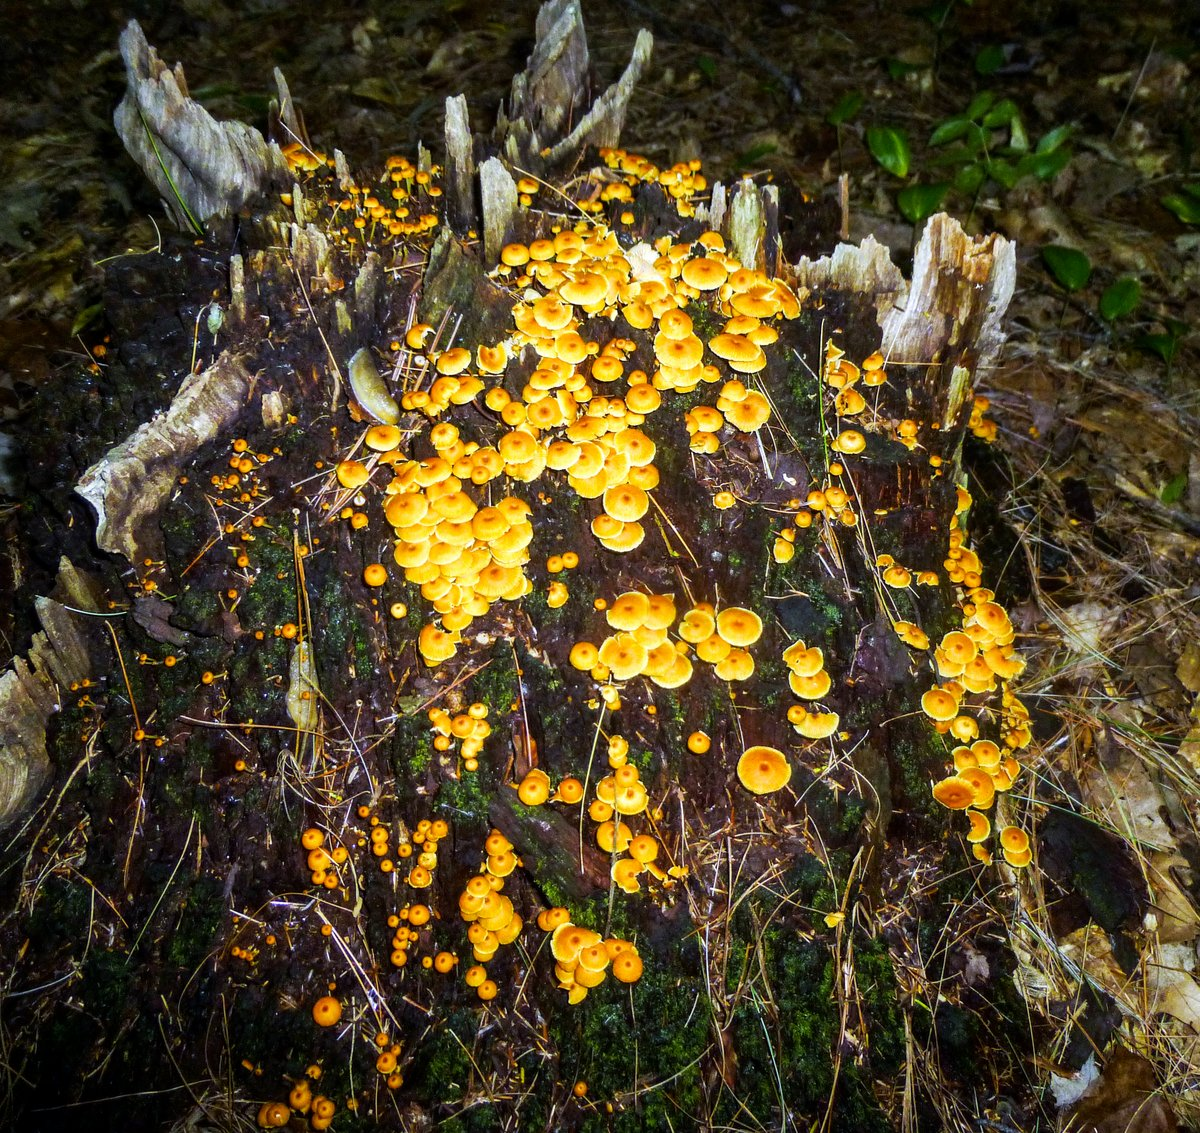 12. Orange Xeromphalina kauffmanii Mushrooms